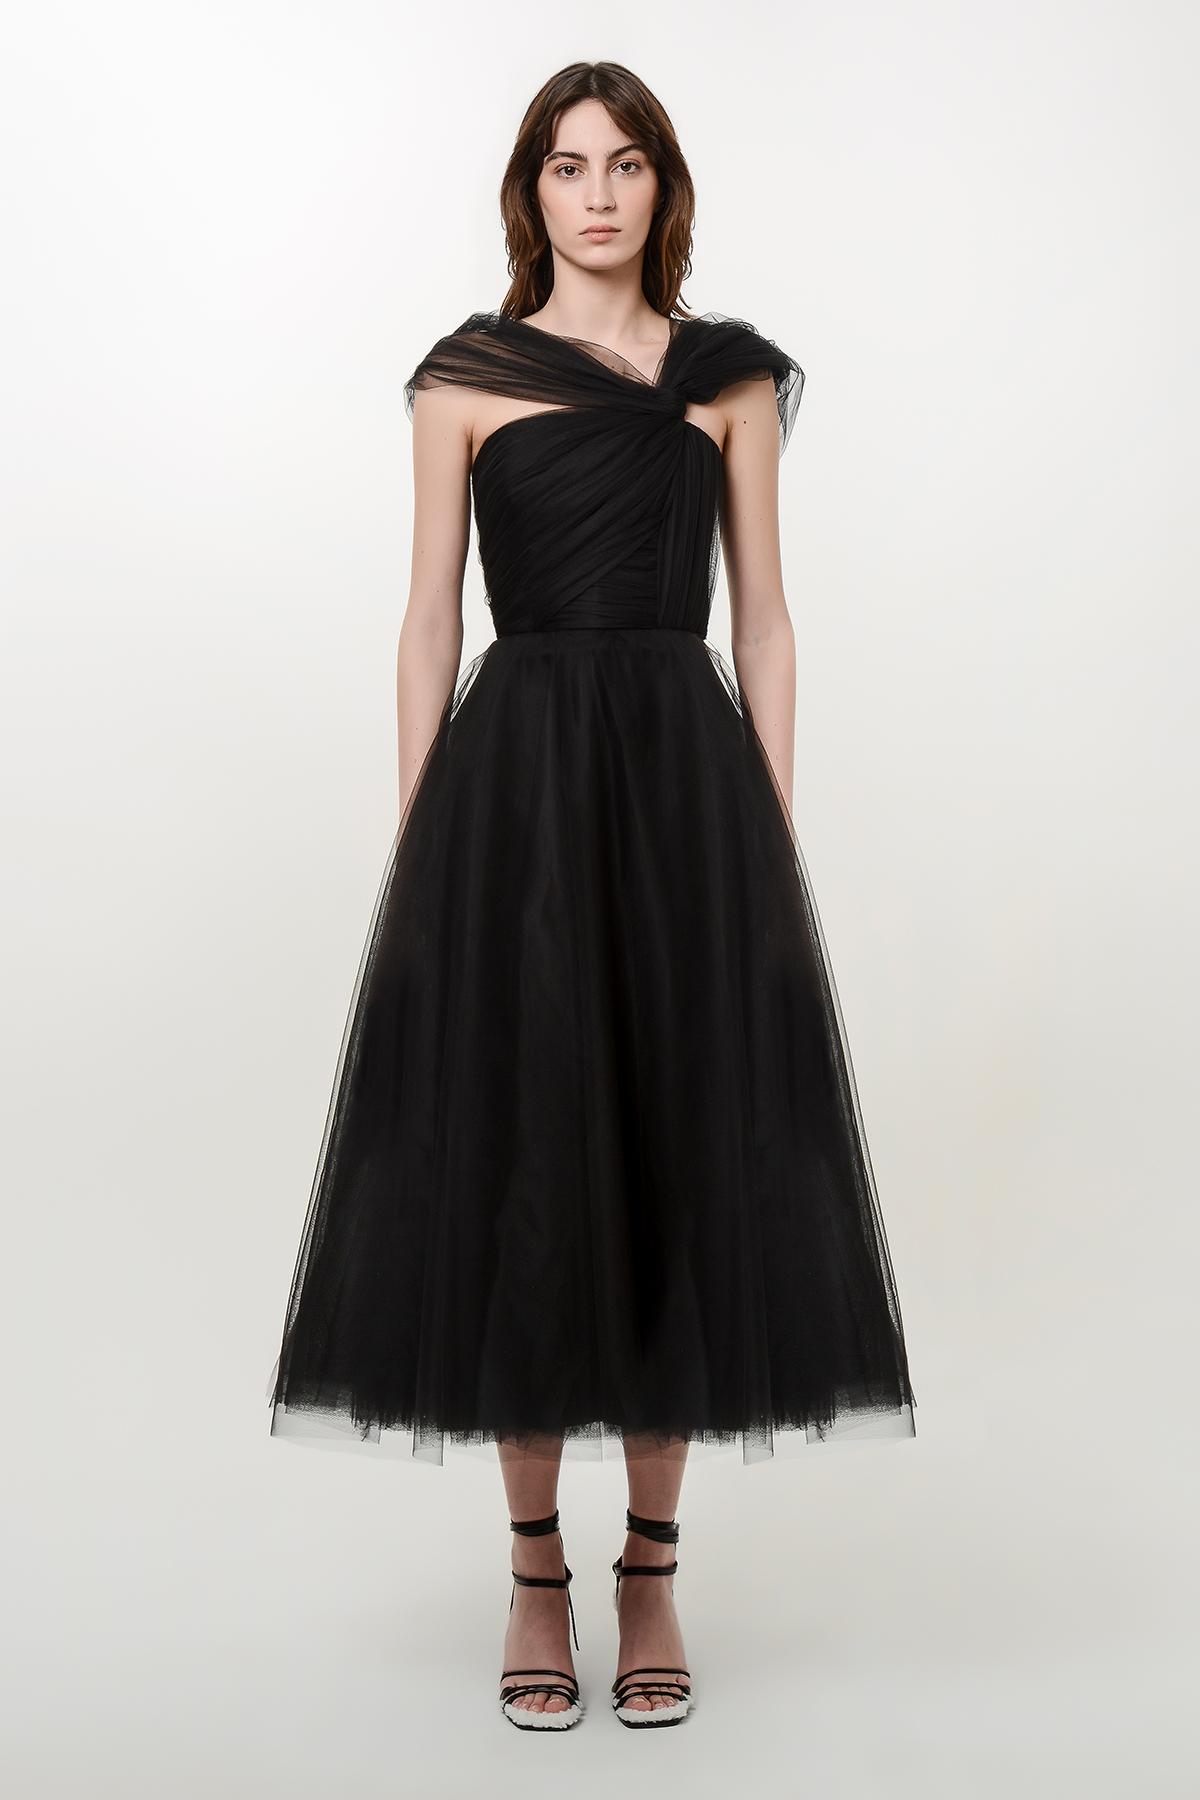 Corset style tulle dress 1